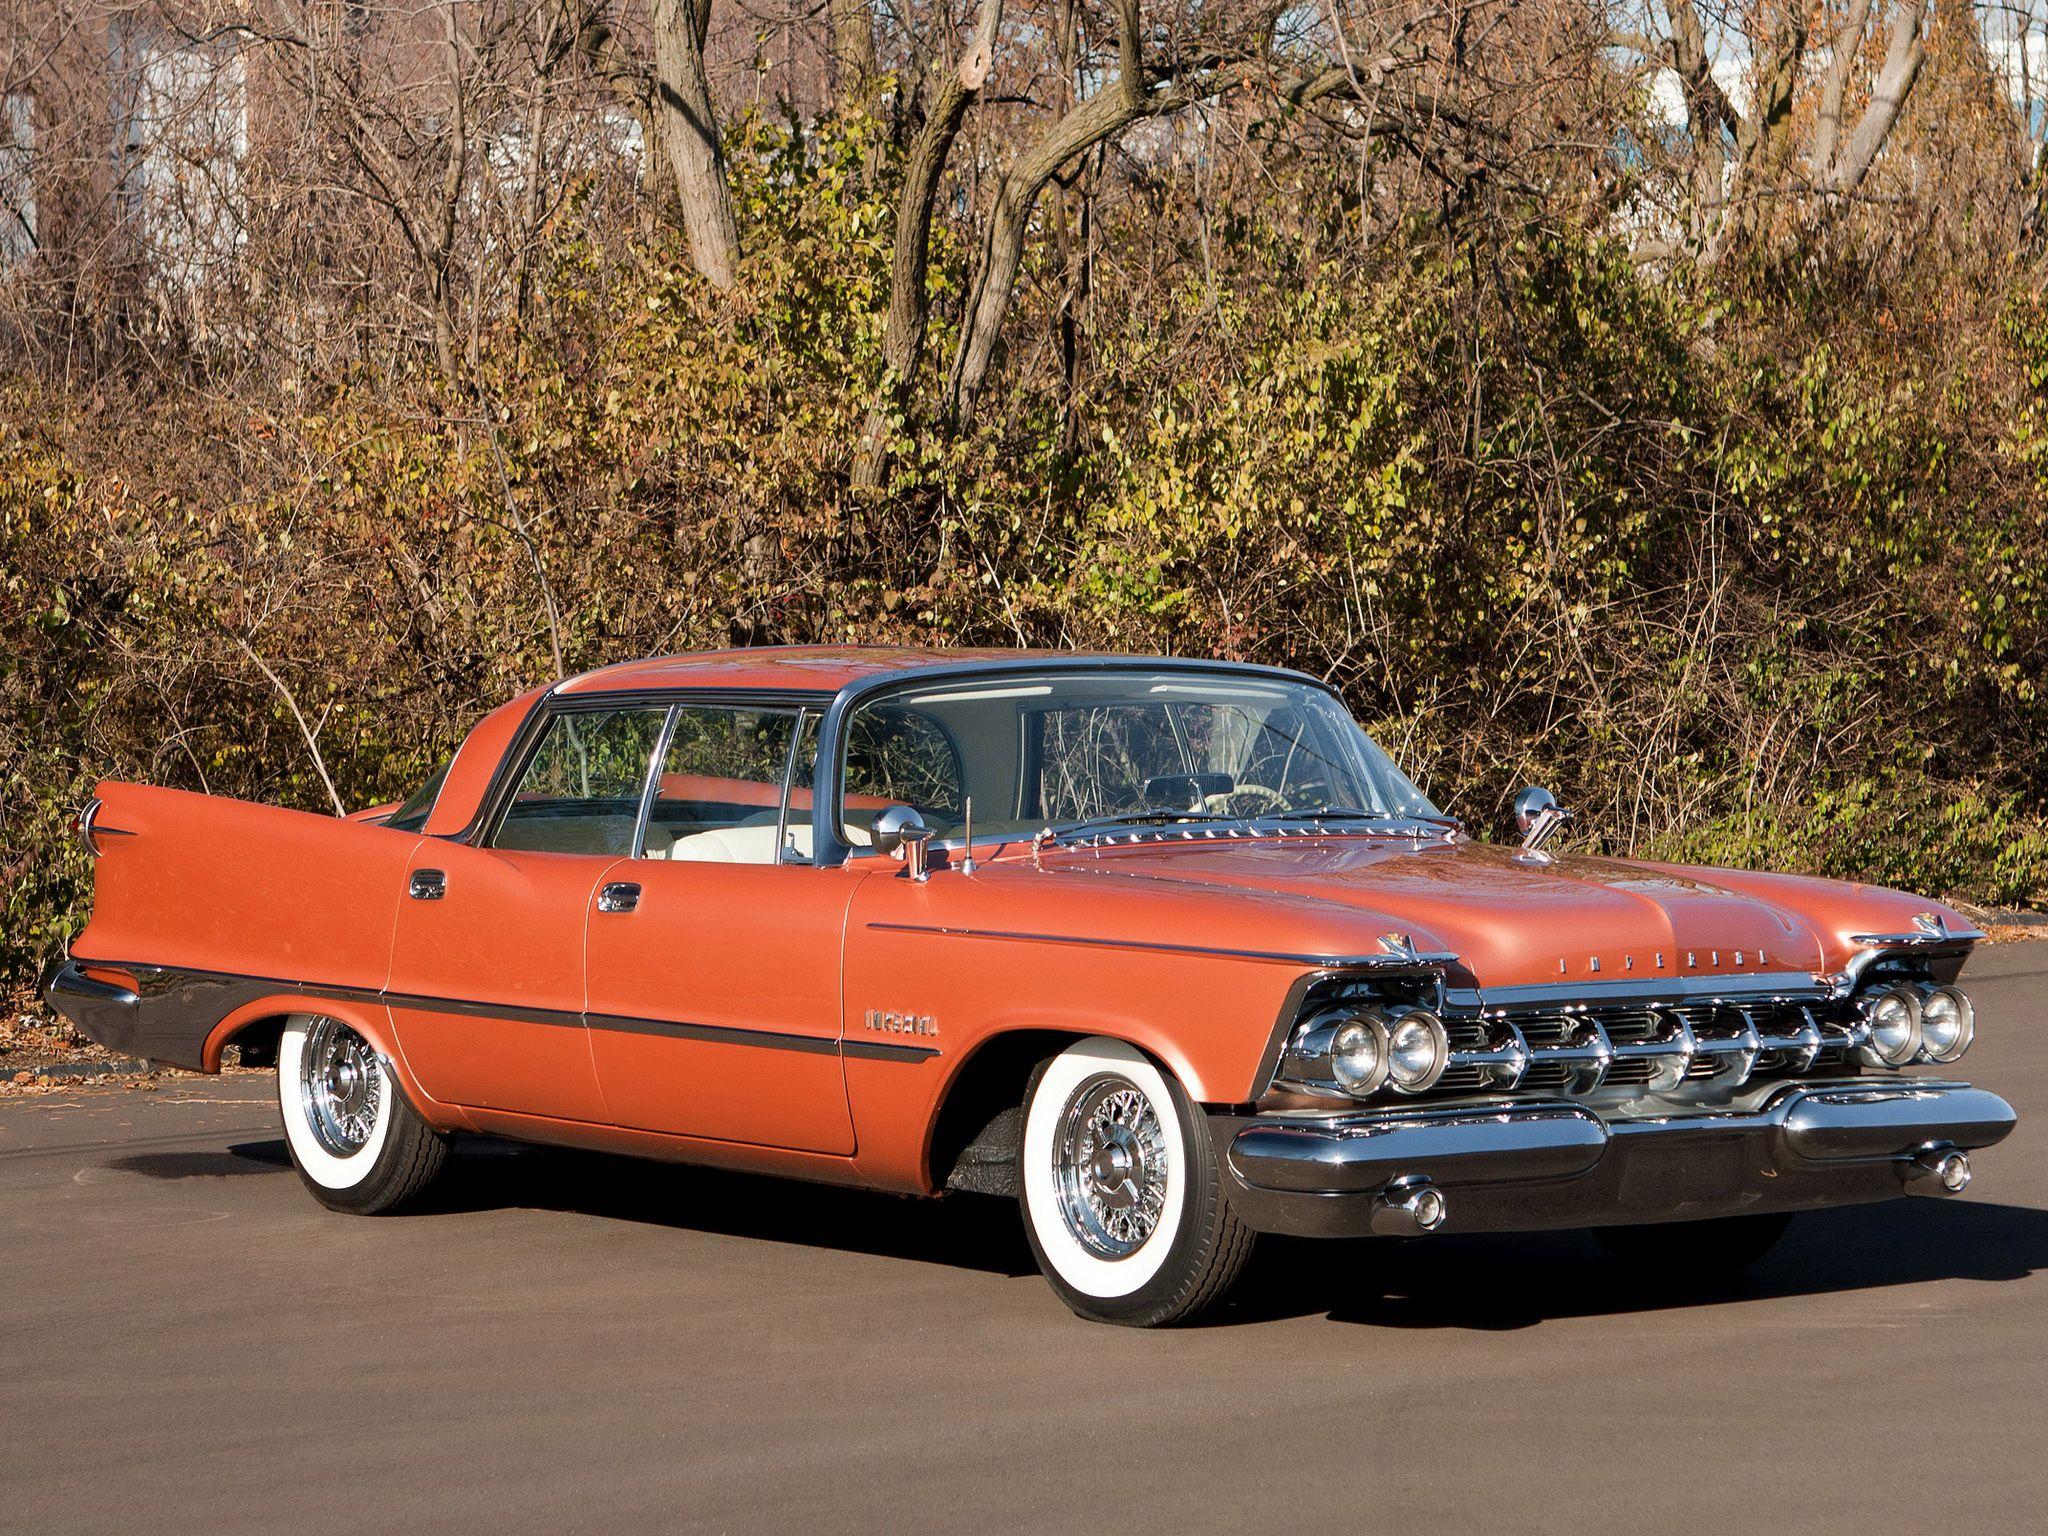 1959 Chrysler Imperial 1959 Chrysler Imperial Crown Southampton